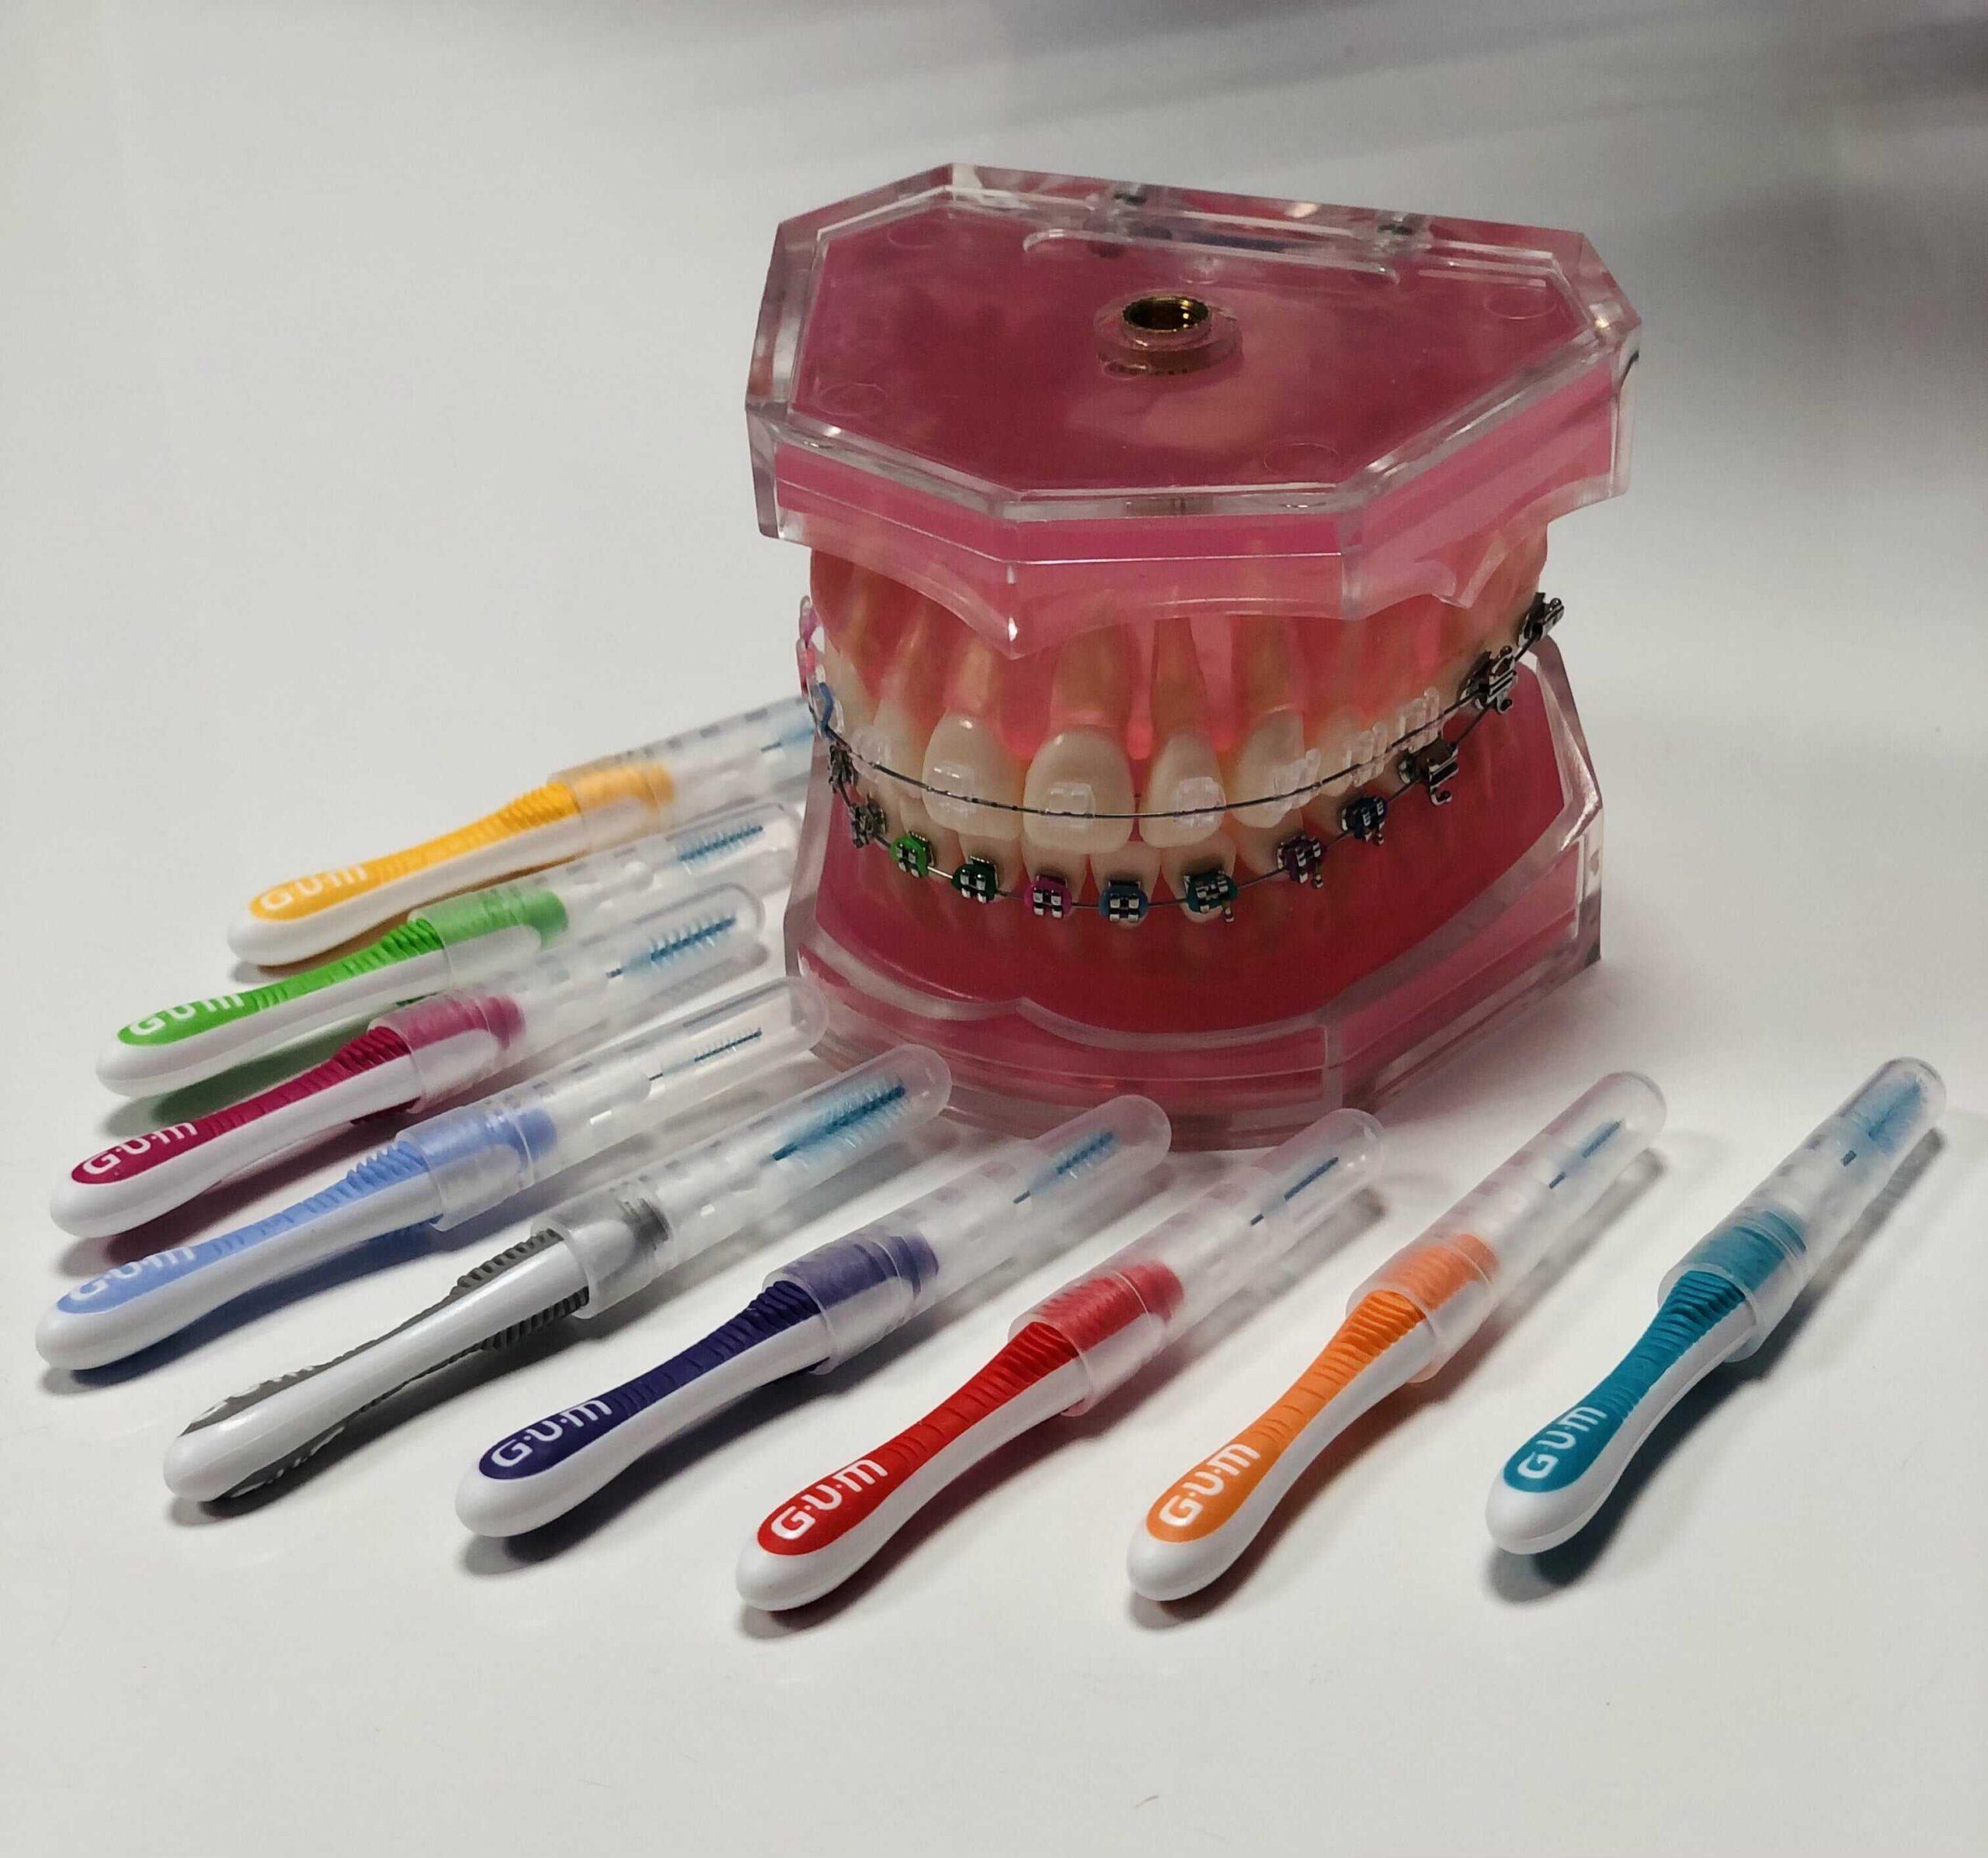 Ортодонтические ёршики, ЗФ Стоматология